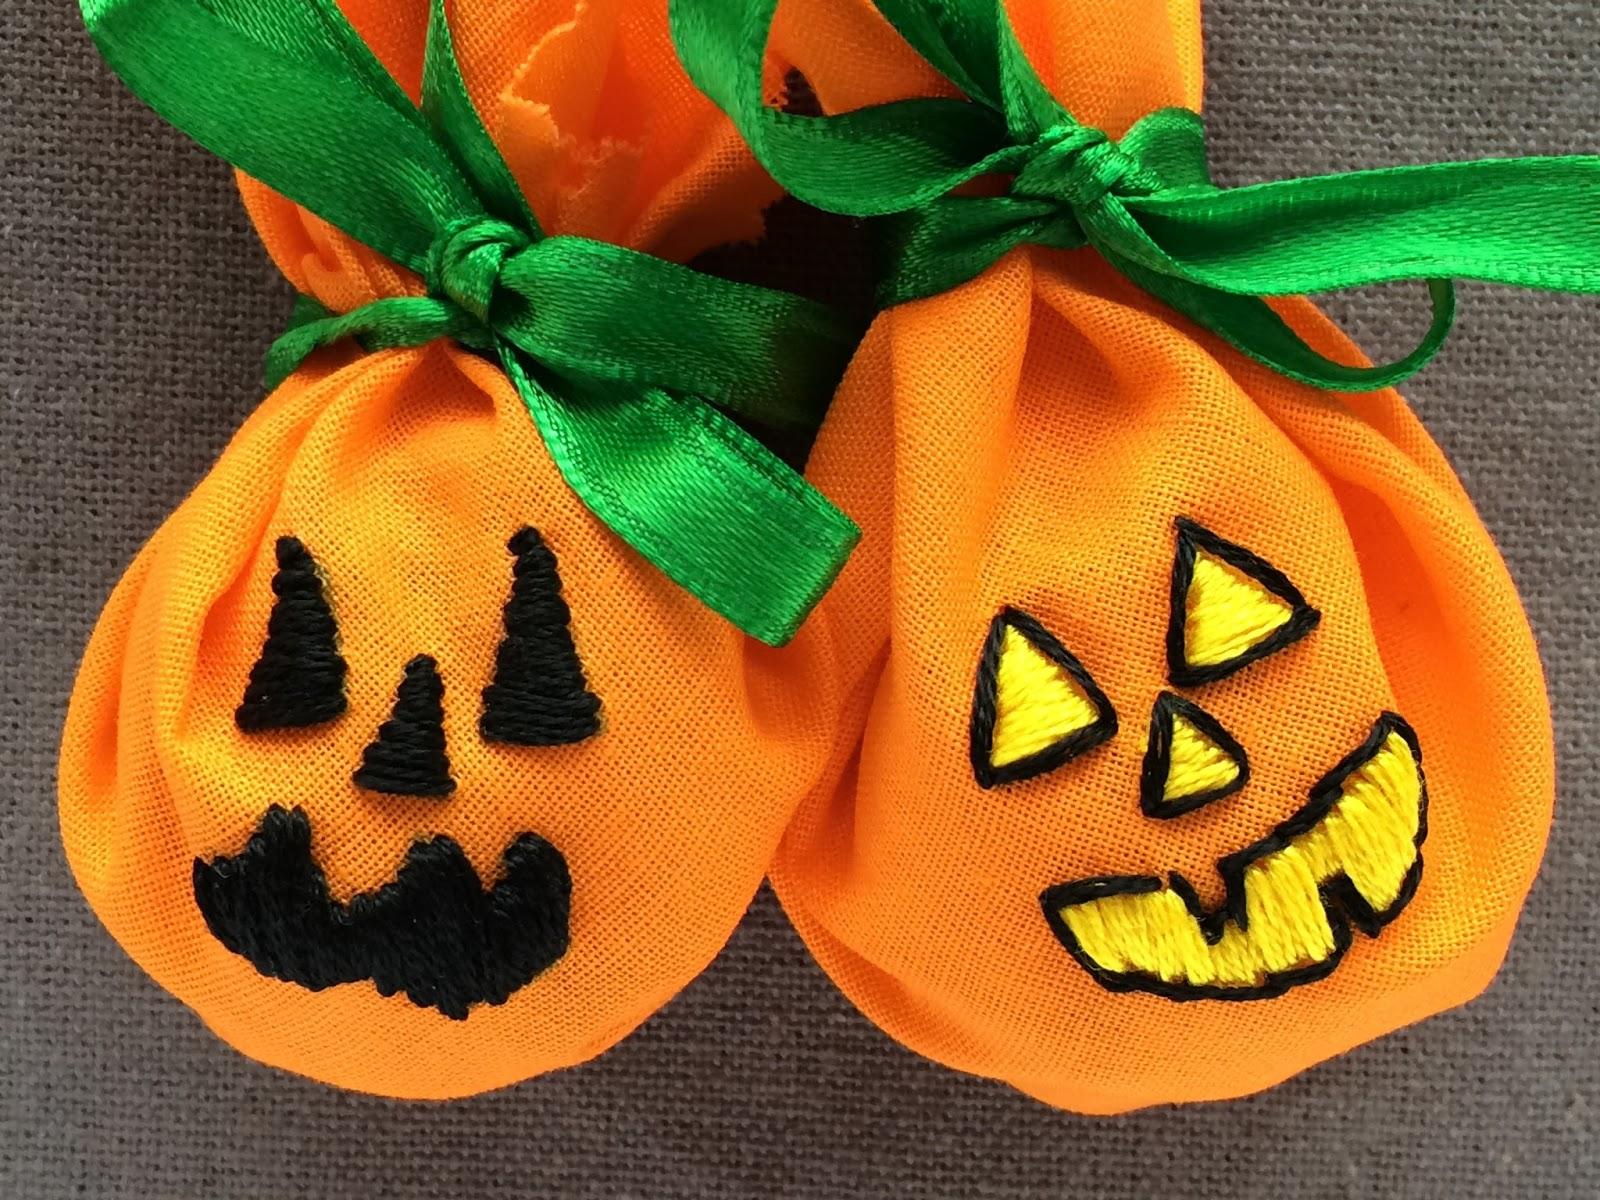 embroidered halloween pumpkin lollipop covers